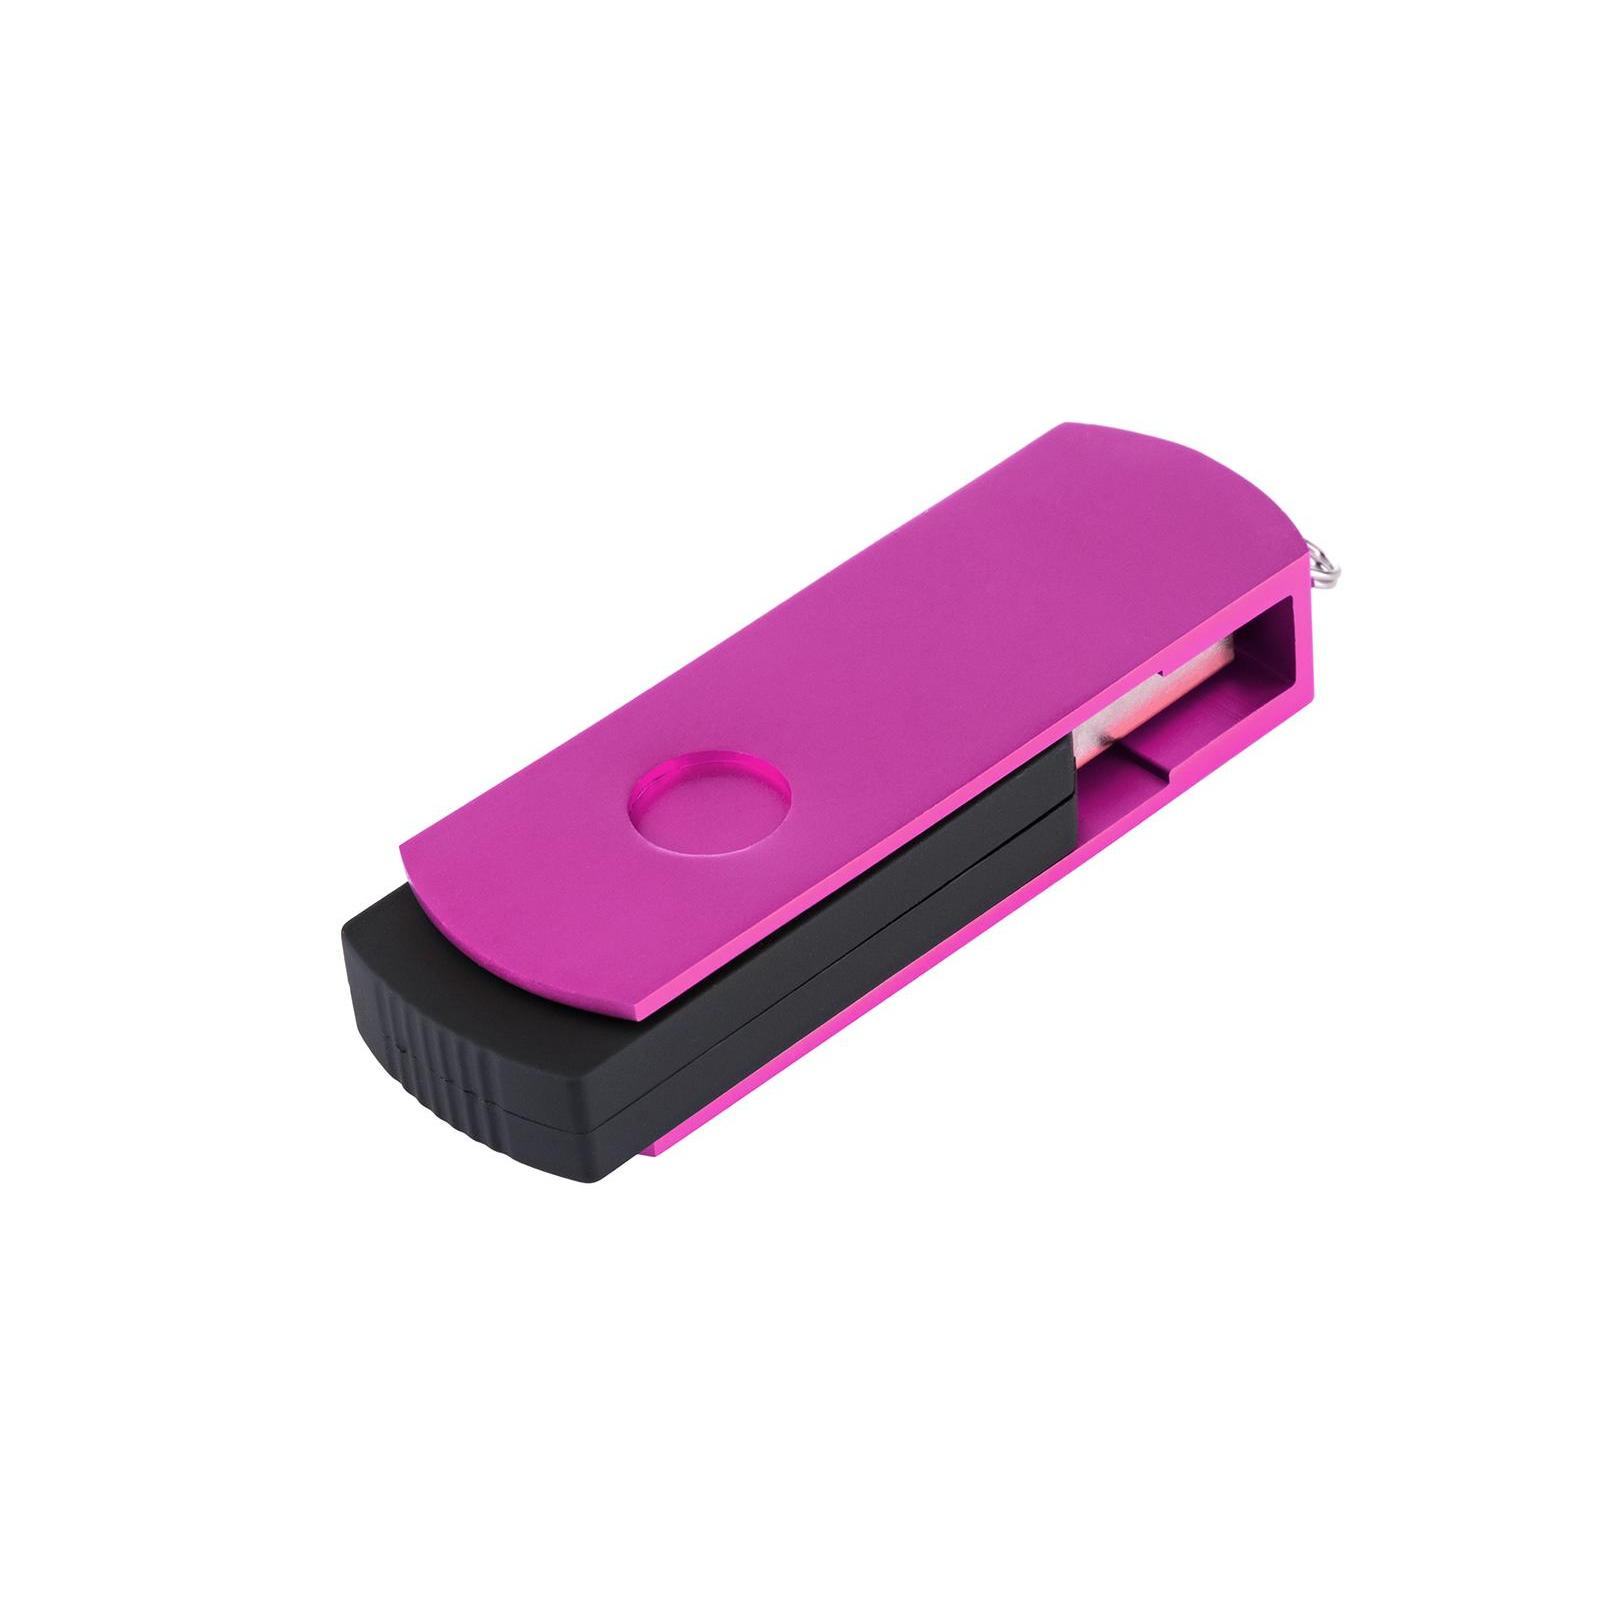 USB флеш накопитель eXceleram 16GB P2 Series Purple/Black USB 3.1 Gen 1 (EXP2U3PUB16) изображение 6